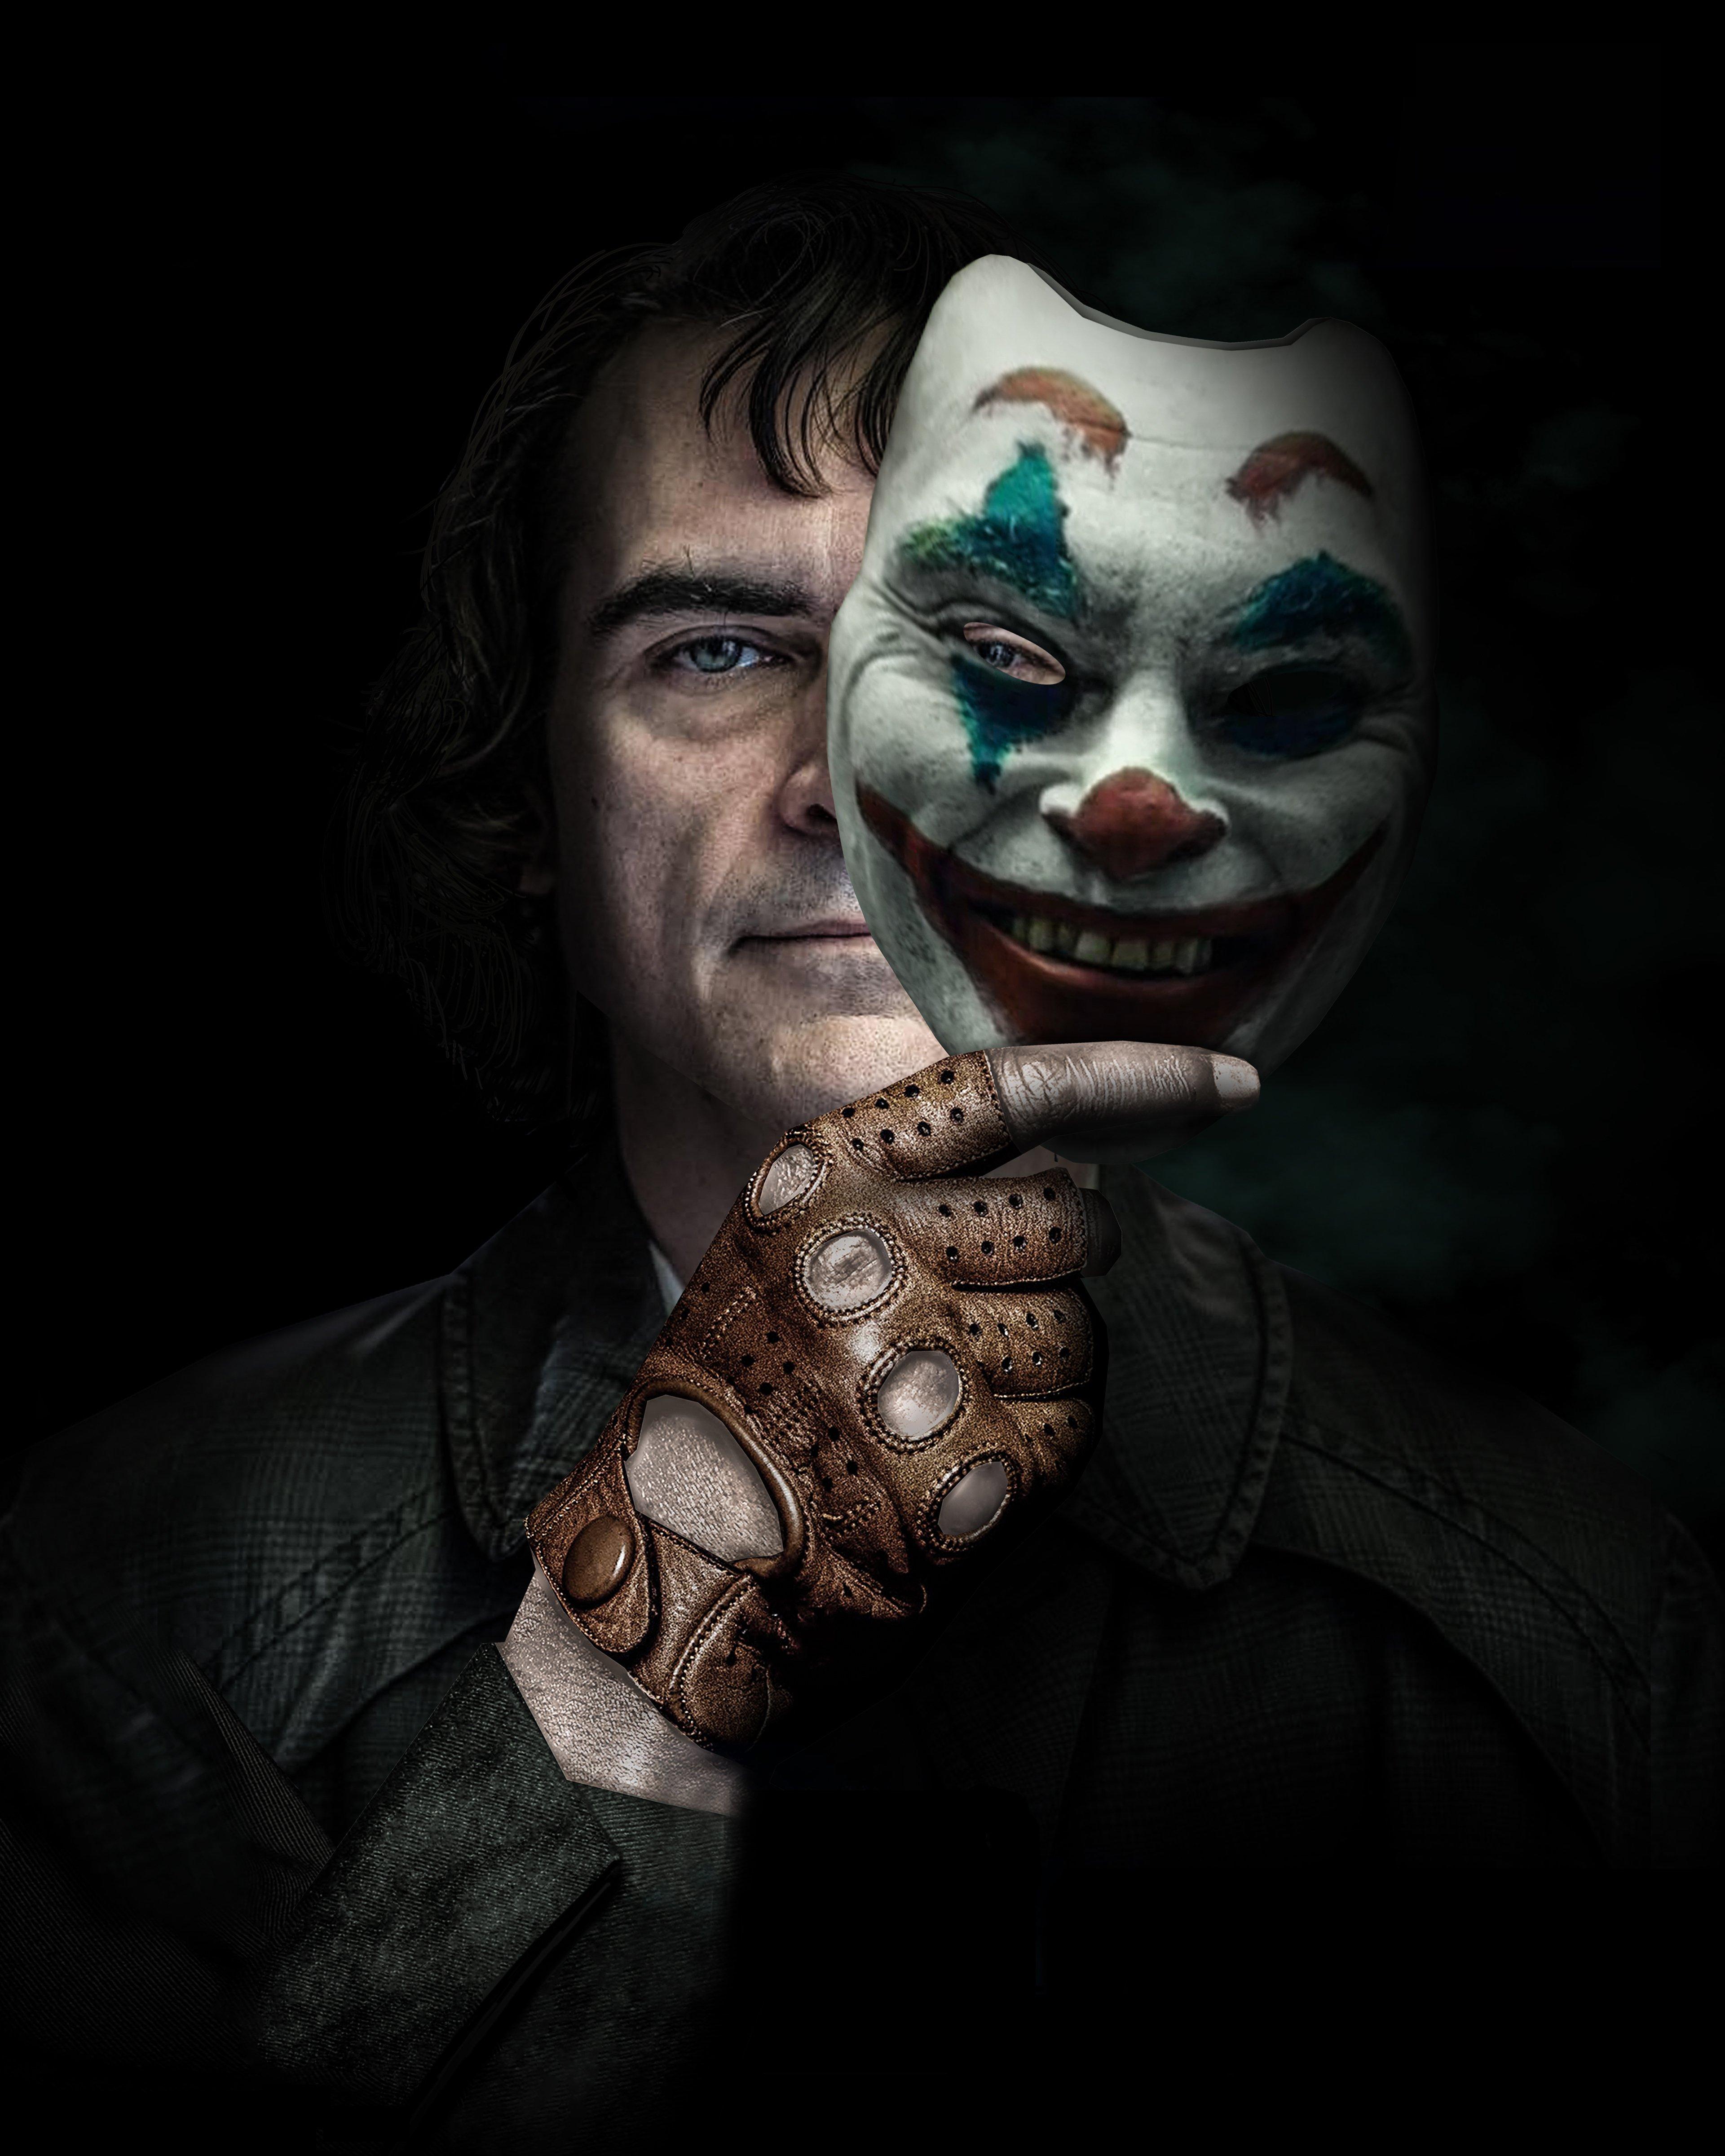 Joker 2019 Movie 4K Wallpaper HD Movies 4K Wallpapers Images 3841x4801